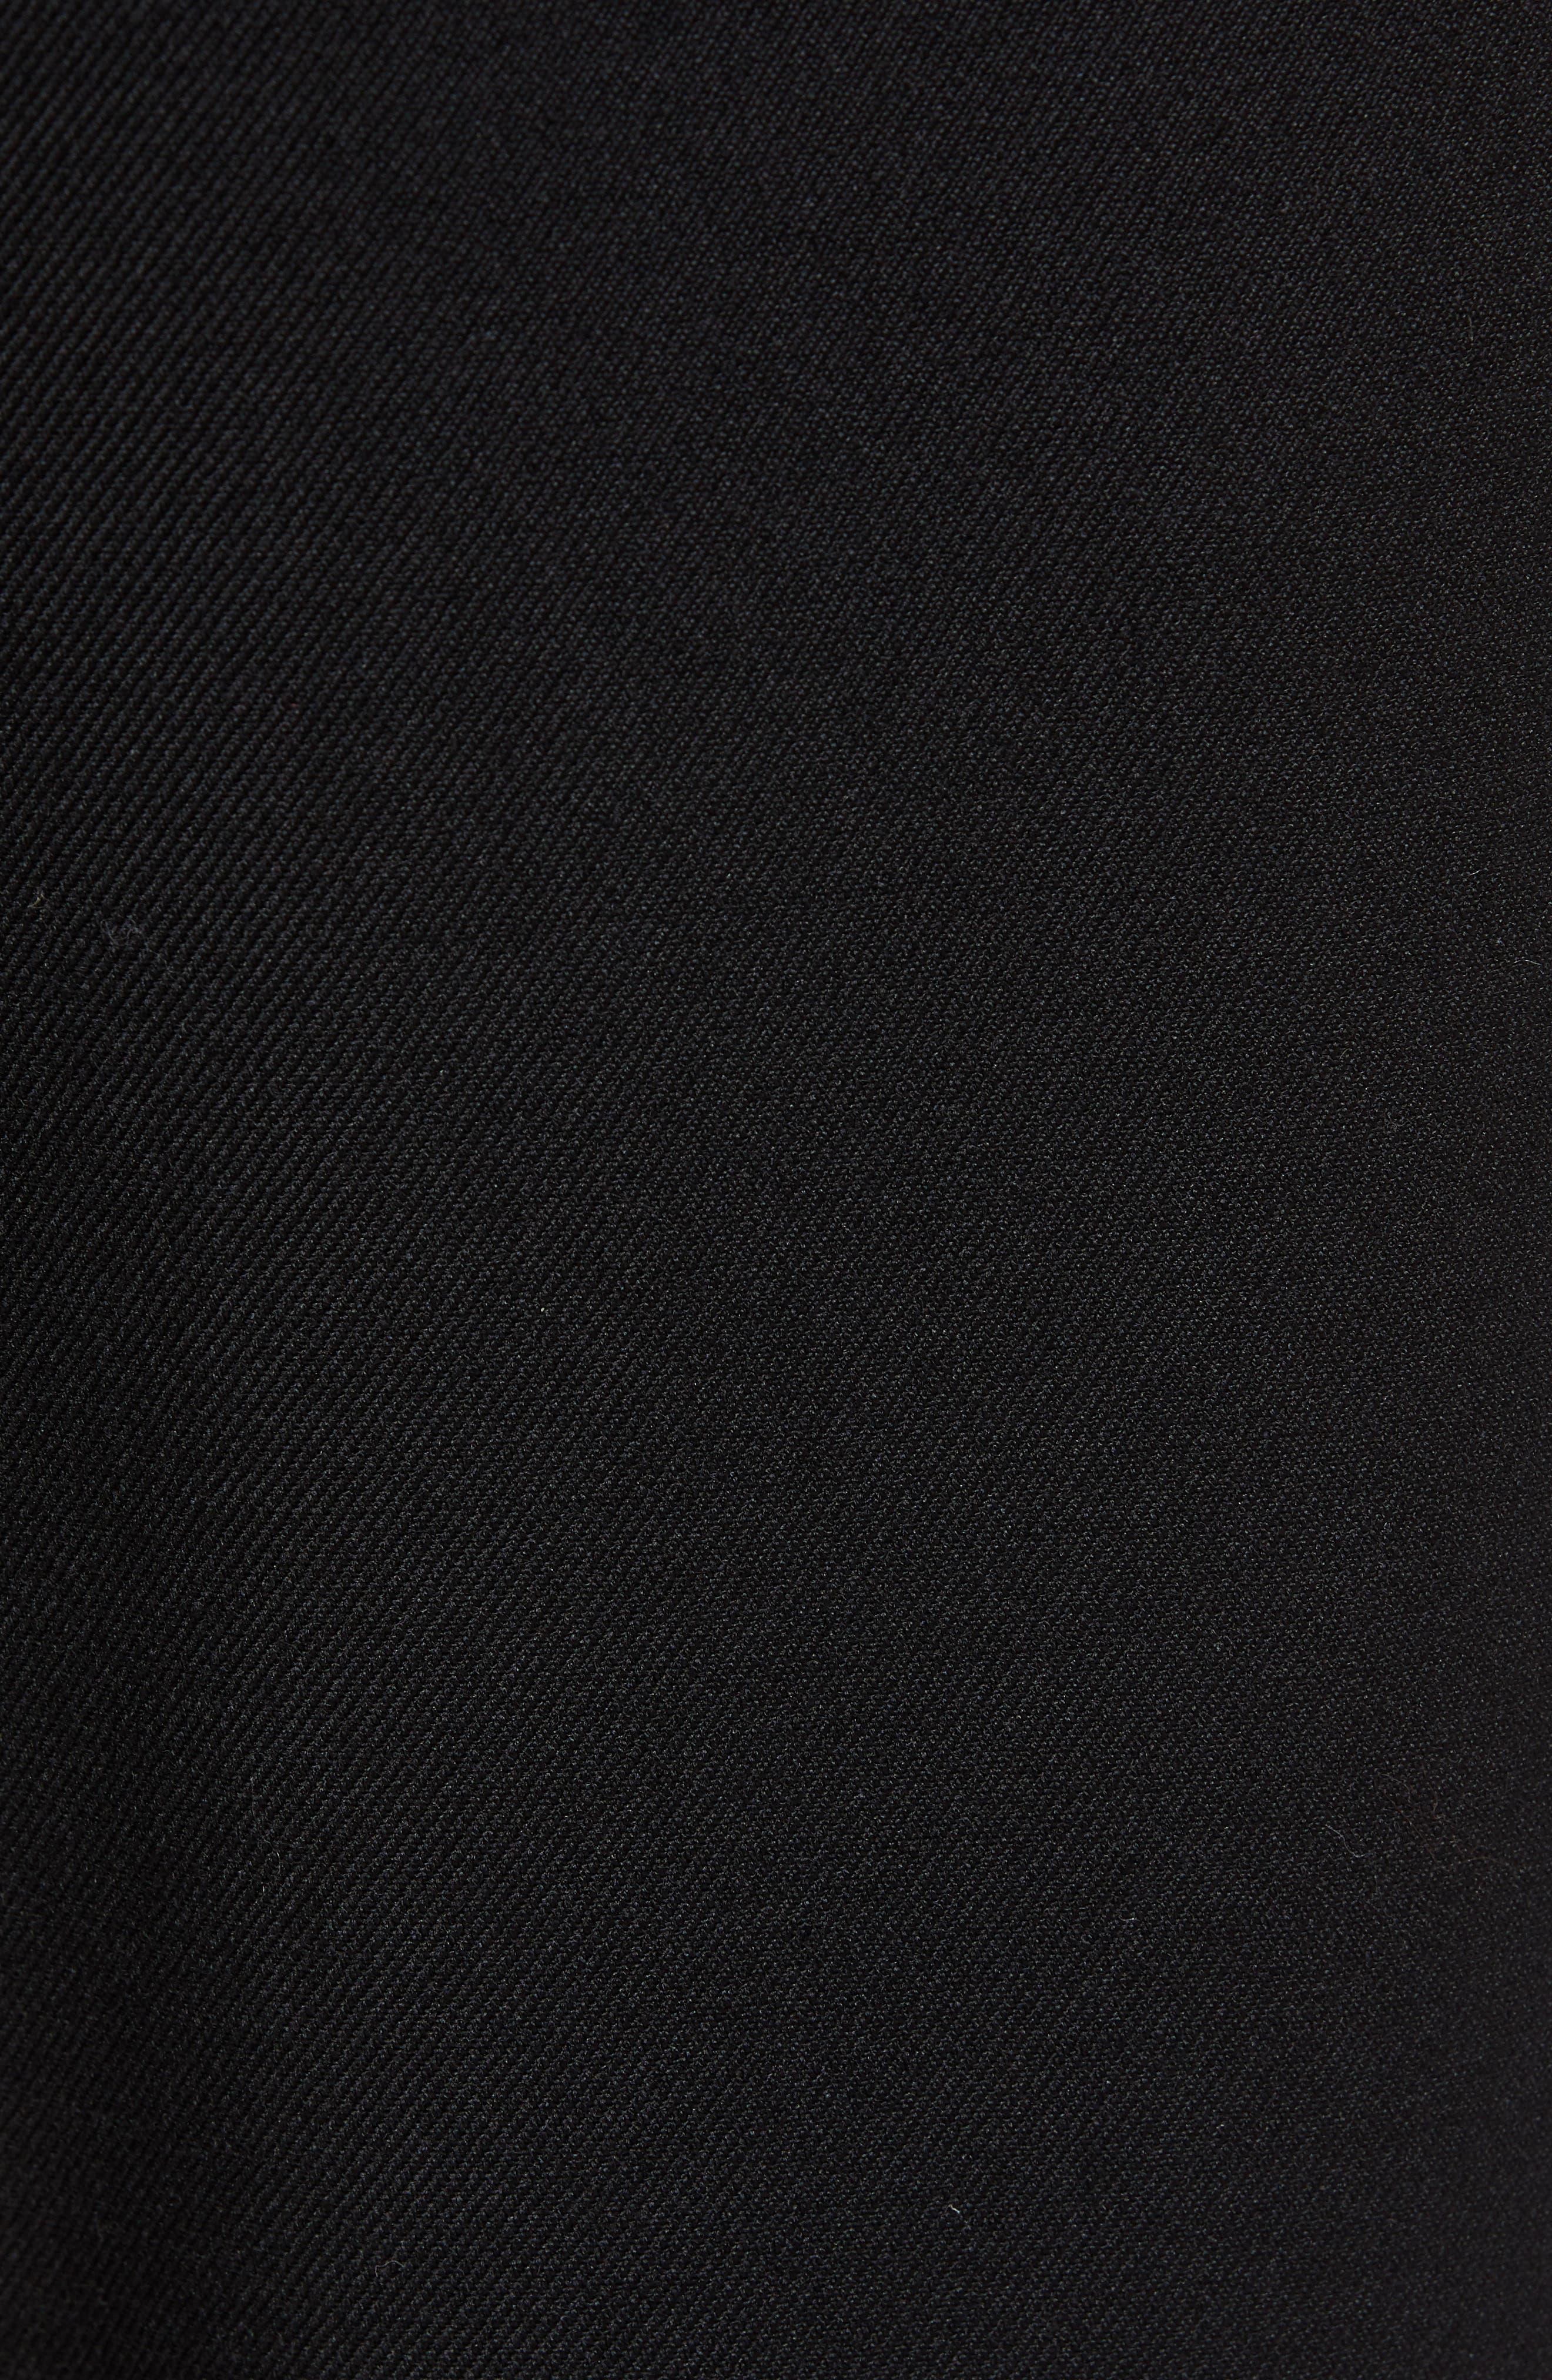 THE KOOPLES, Straight Leg Woven Jogger Pants, Alternate thumbnail 6, color, BLACK